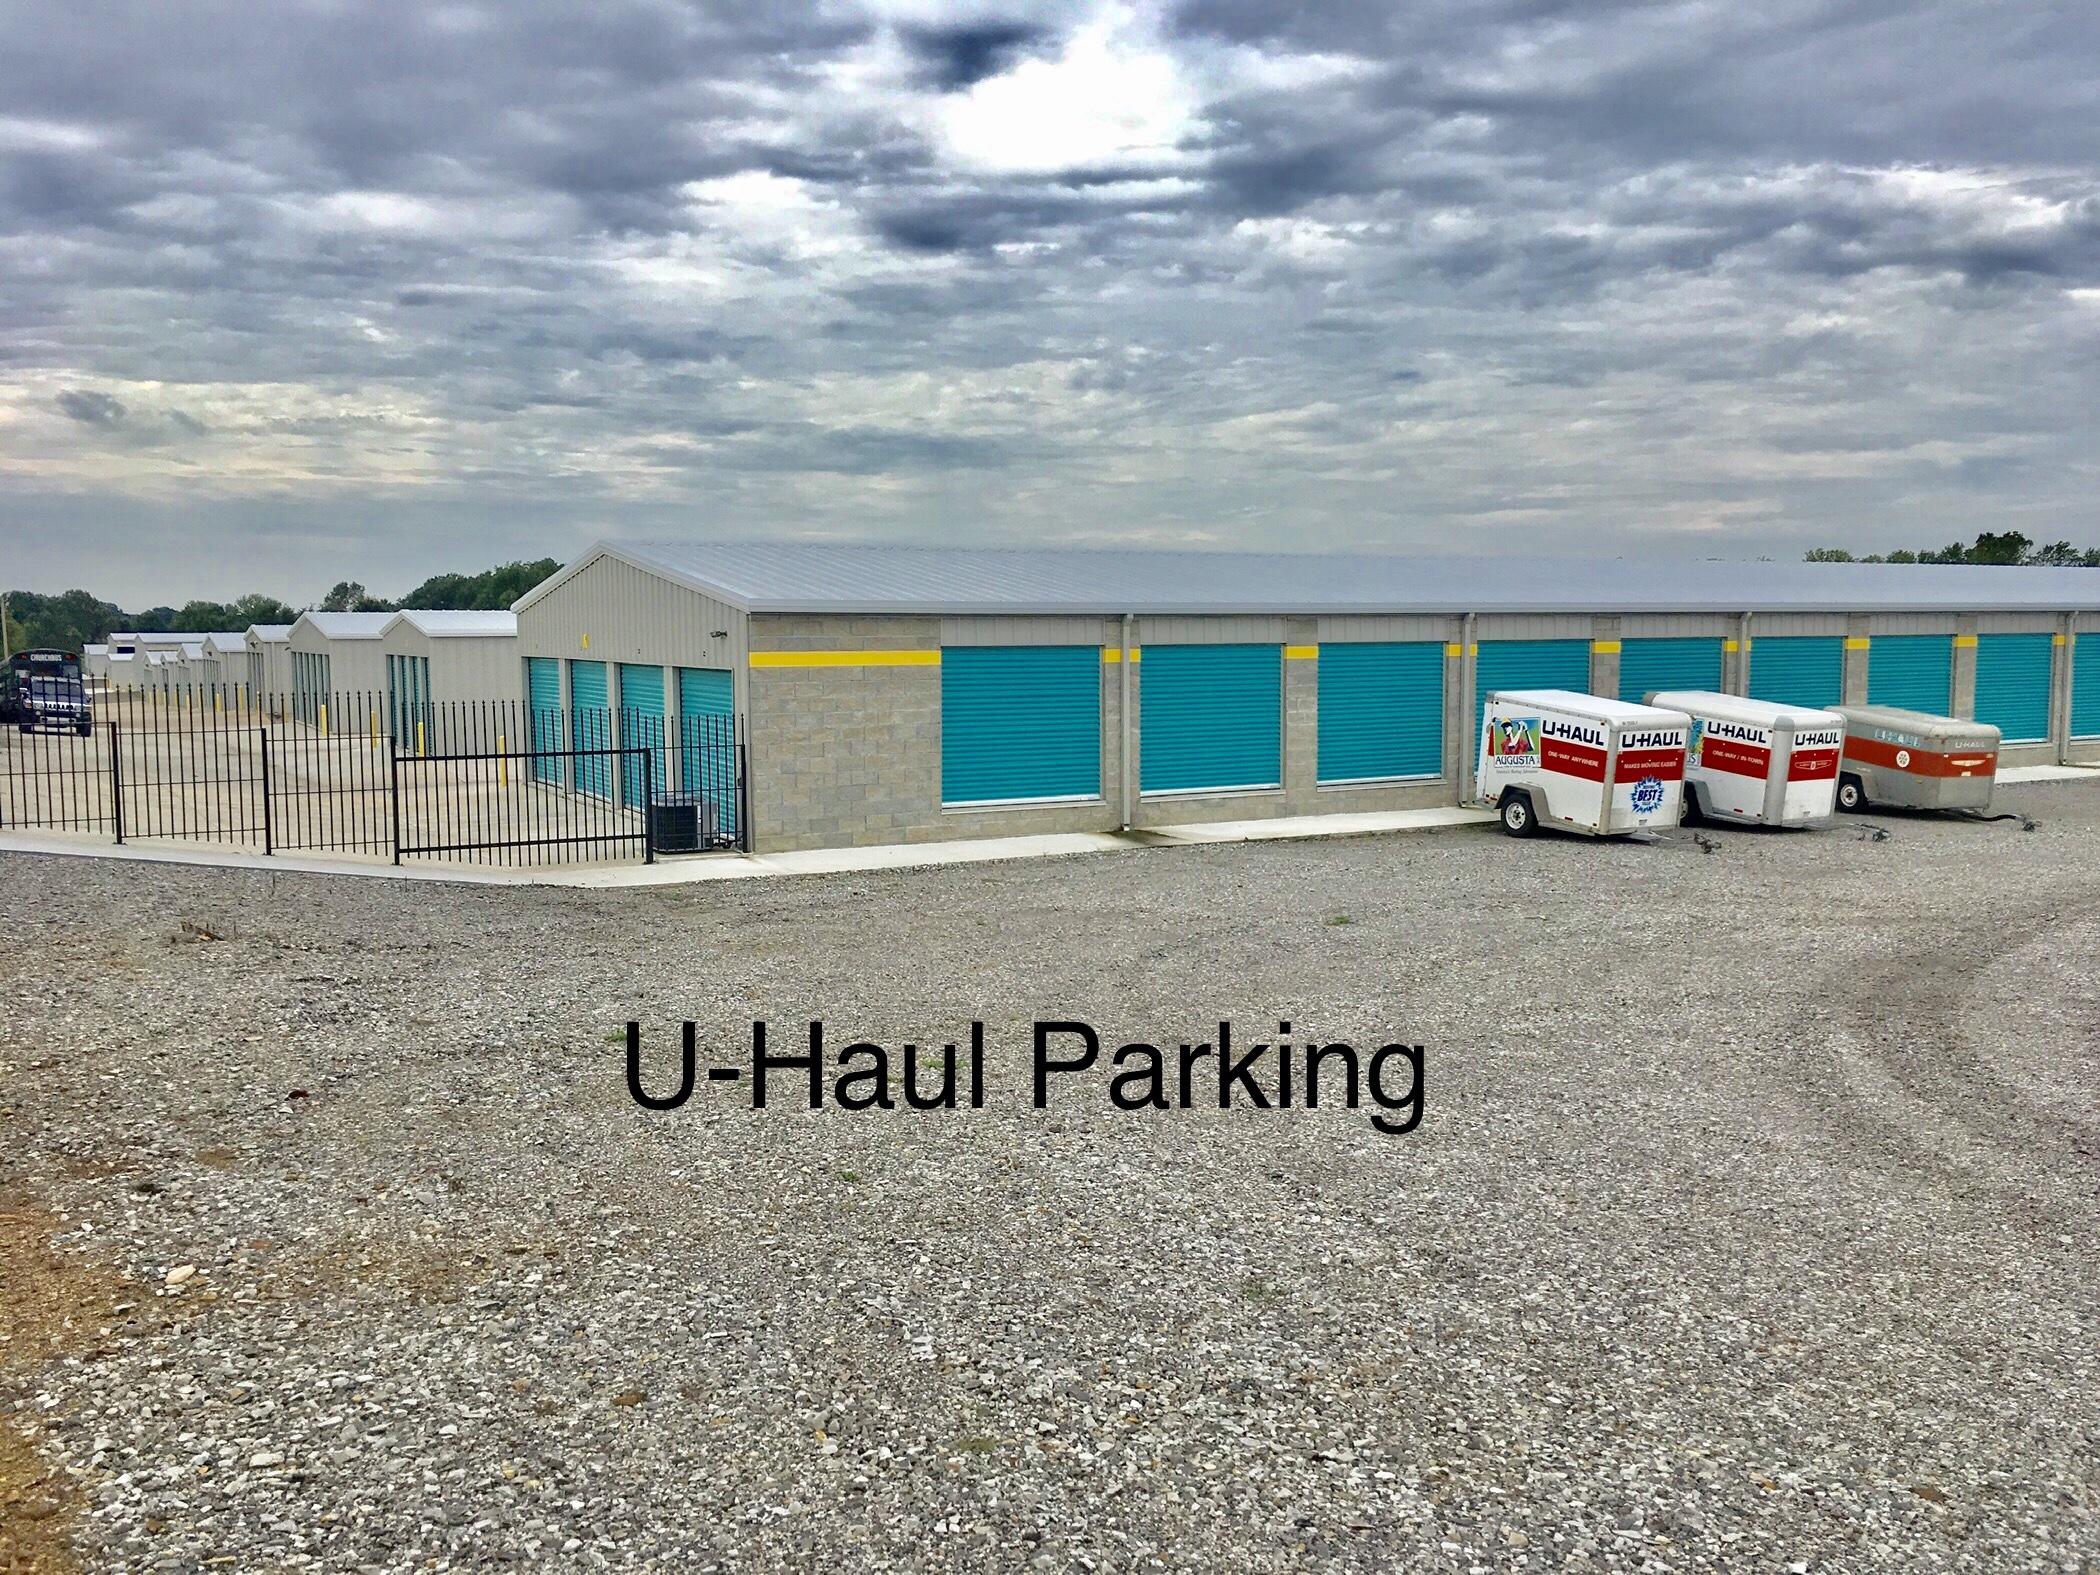 U-haul parking